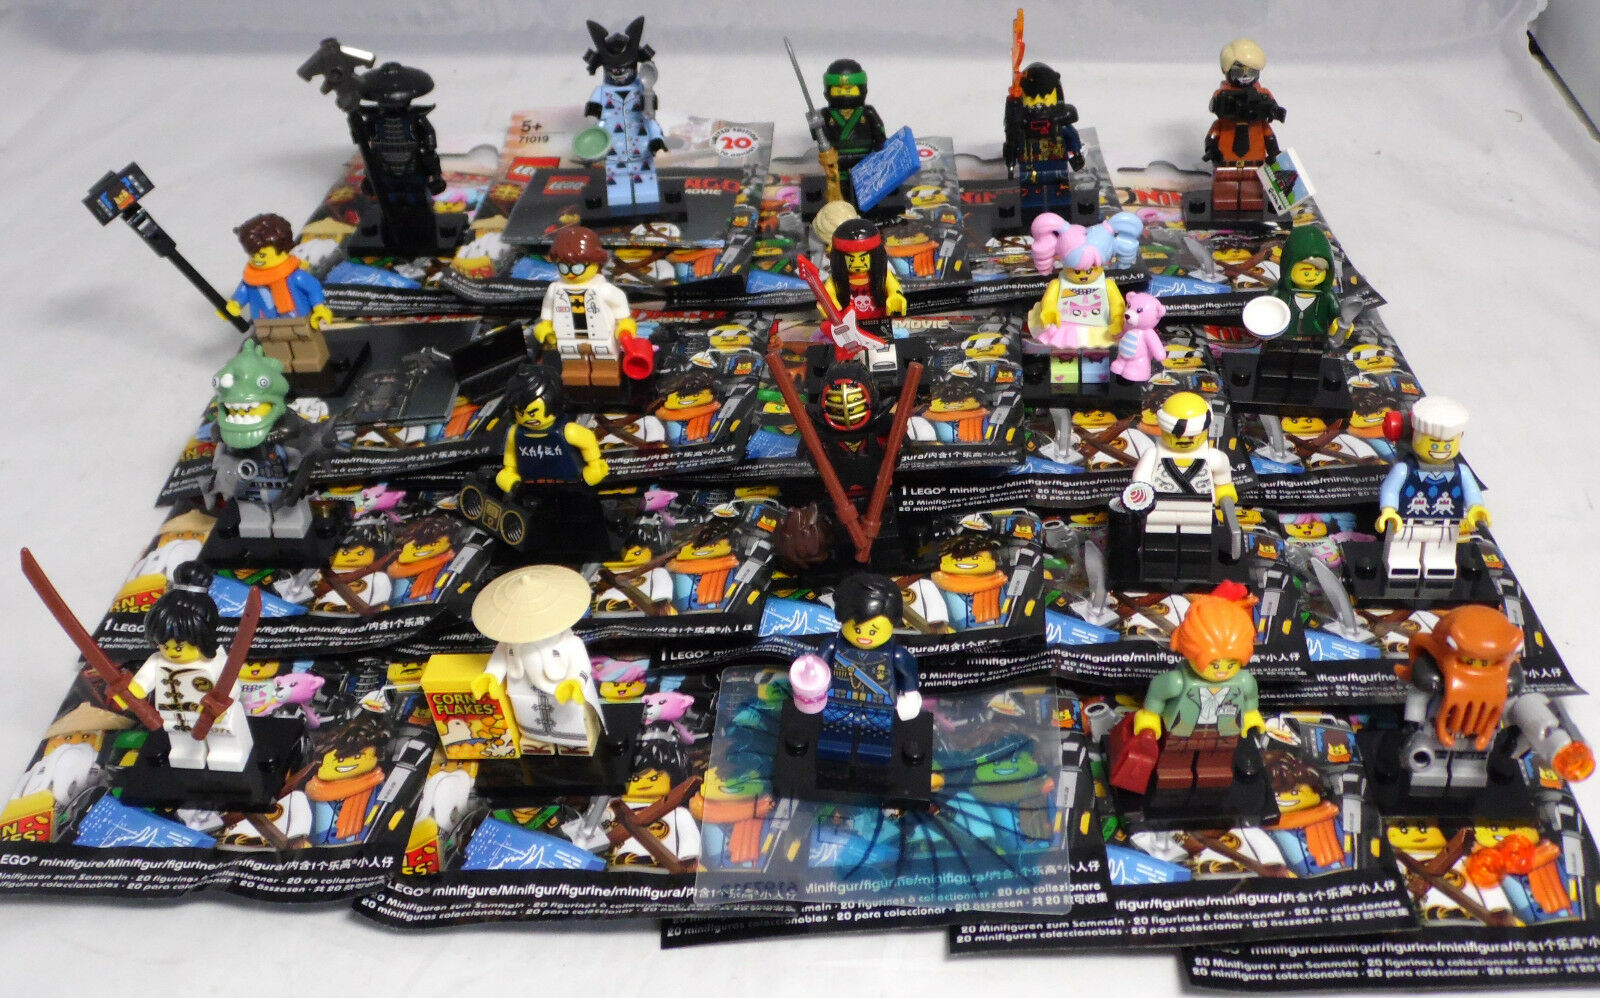 Lego 71019 Ninjago Movie, 1 completo conjunto de = 20 minifiguras + DISJugar nuevo New